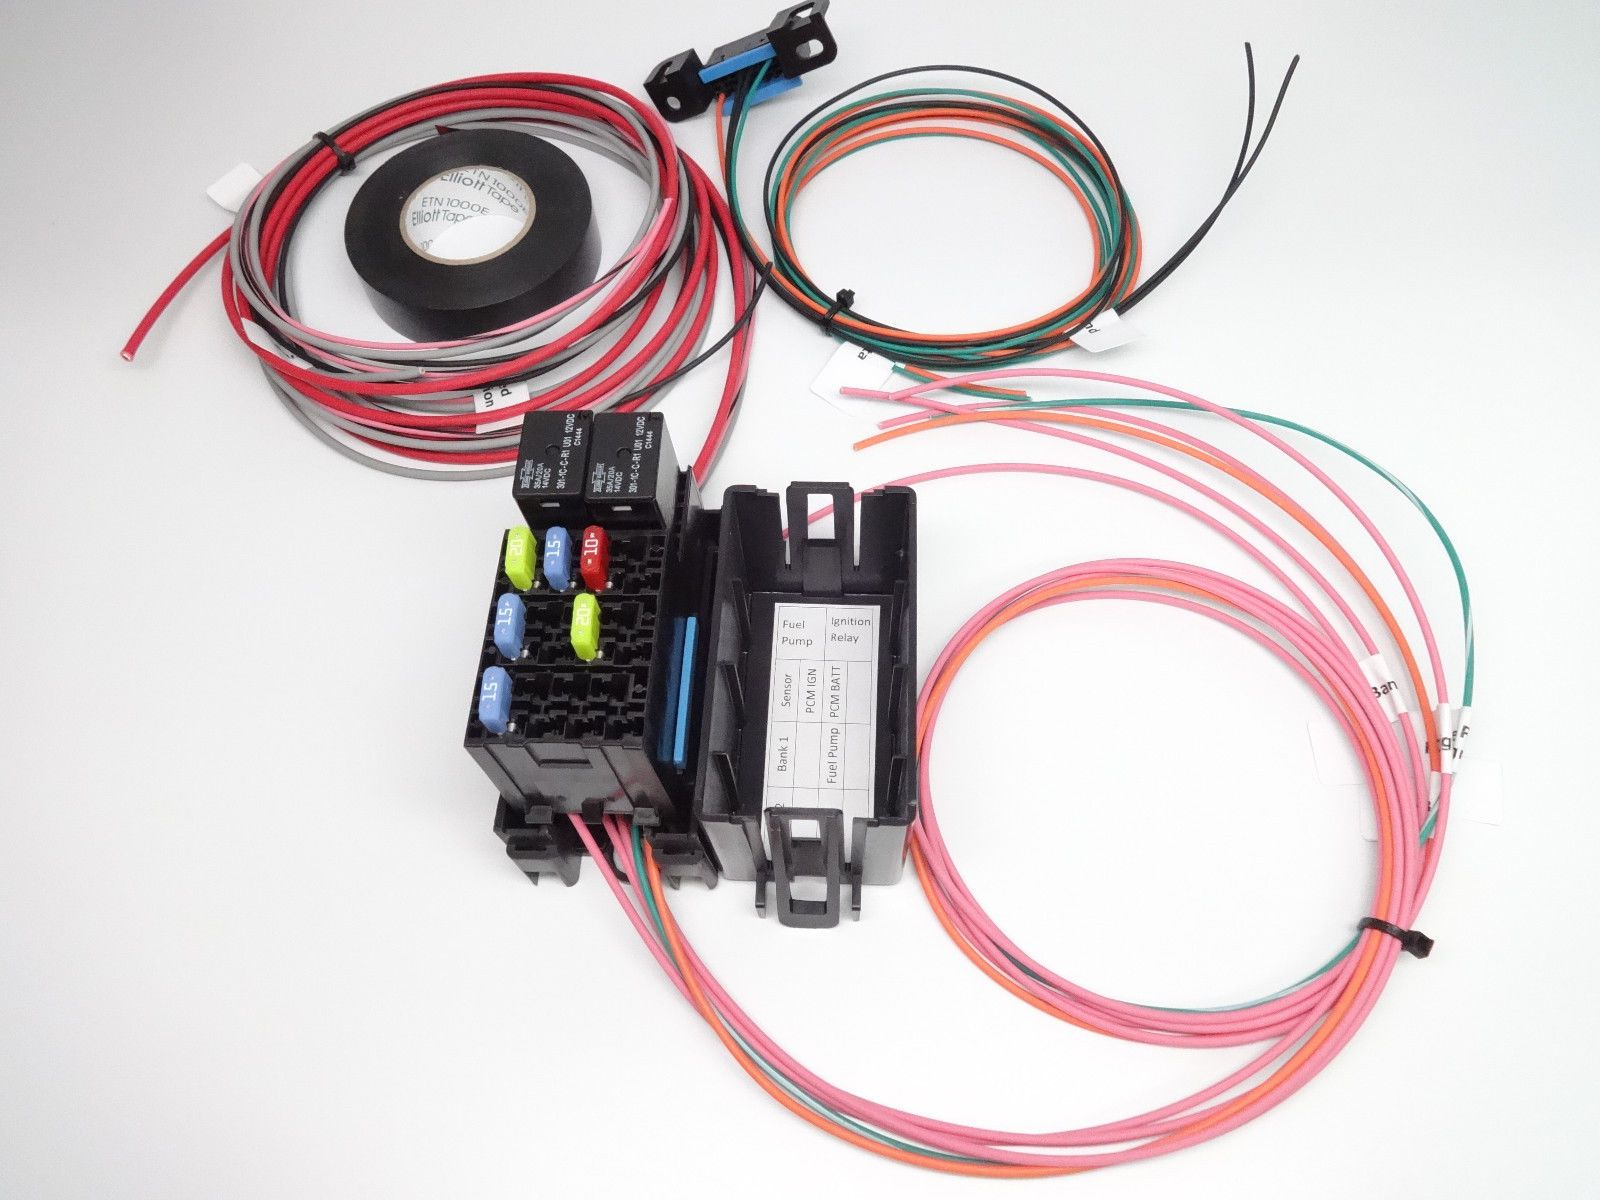 medium resolution of ls1 fuse box pins wiring library rh 73 codingcommunity de fuse profire sight fuse pin pylon